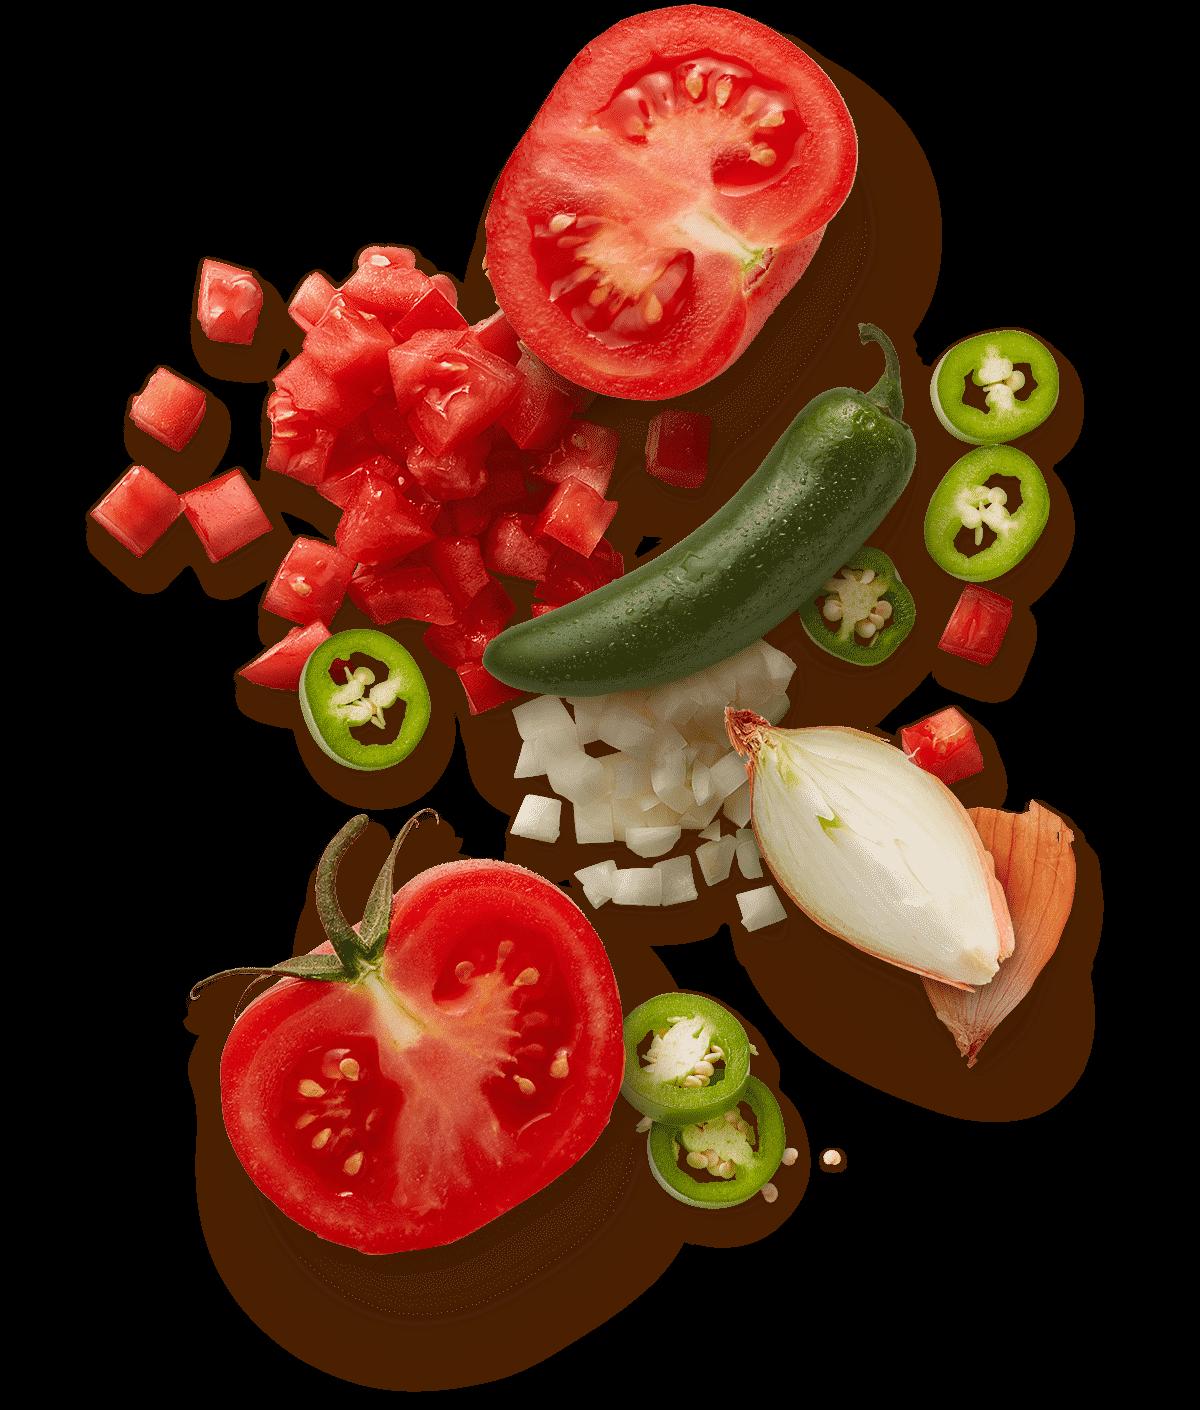 kisspng-salsa-guacamole-vegetarian-cuisine-food-hummus-salsa-5acd85b7c5bd71.99536247152341855181